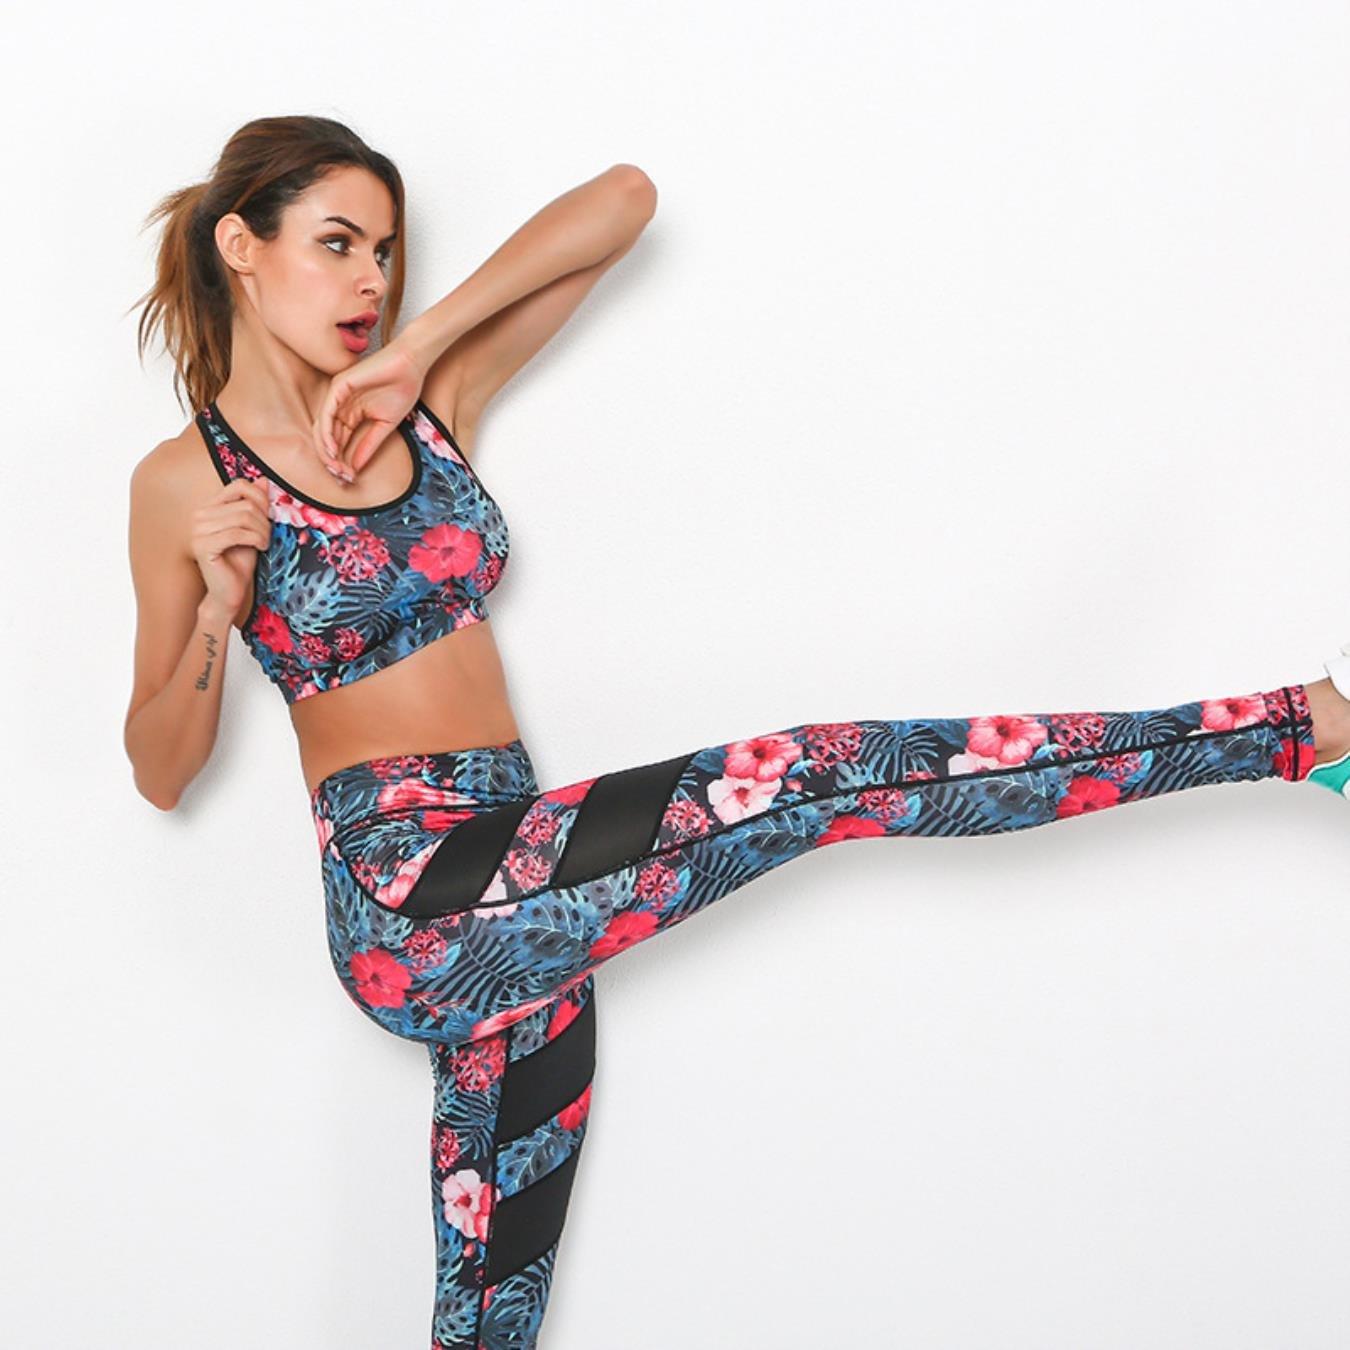 Floral Printed Women Yoga Set Mesh Splice Port Bra Leggings Vintage Sports Clothing